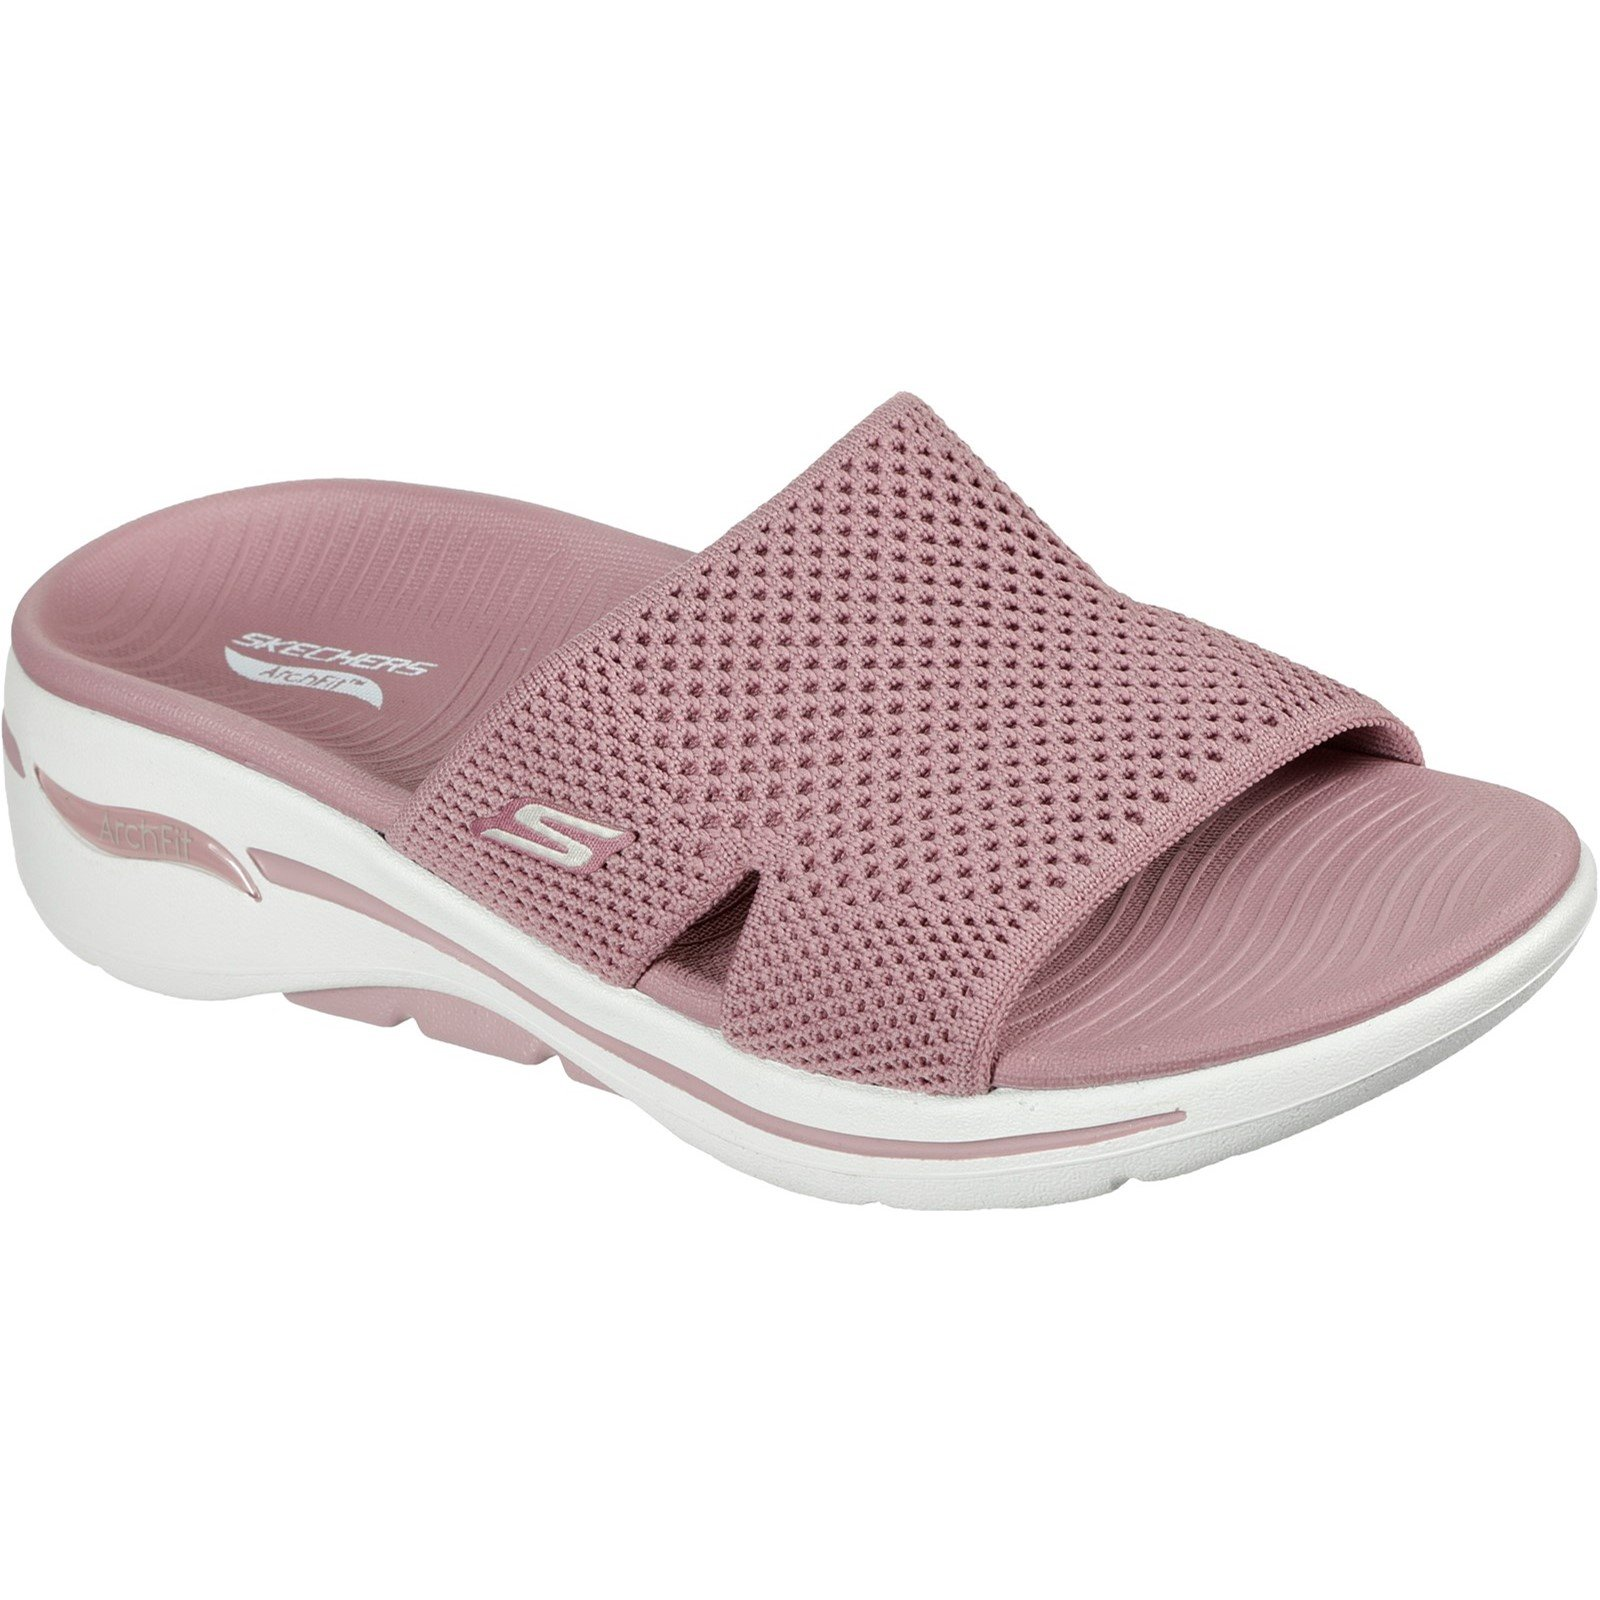 Skechers Women's Go Walk Arch Fit Worthy Summer Sandal Various Colours 32152 - Rose 5